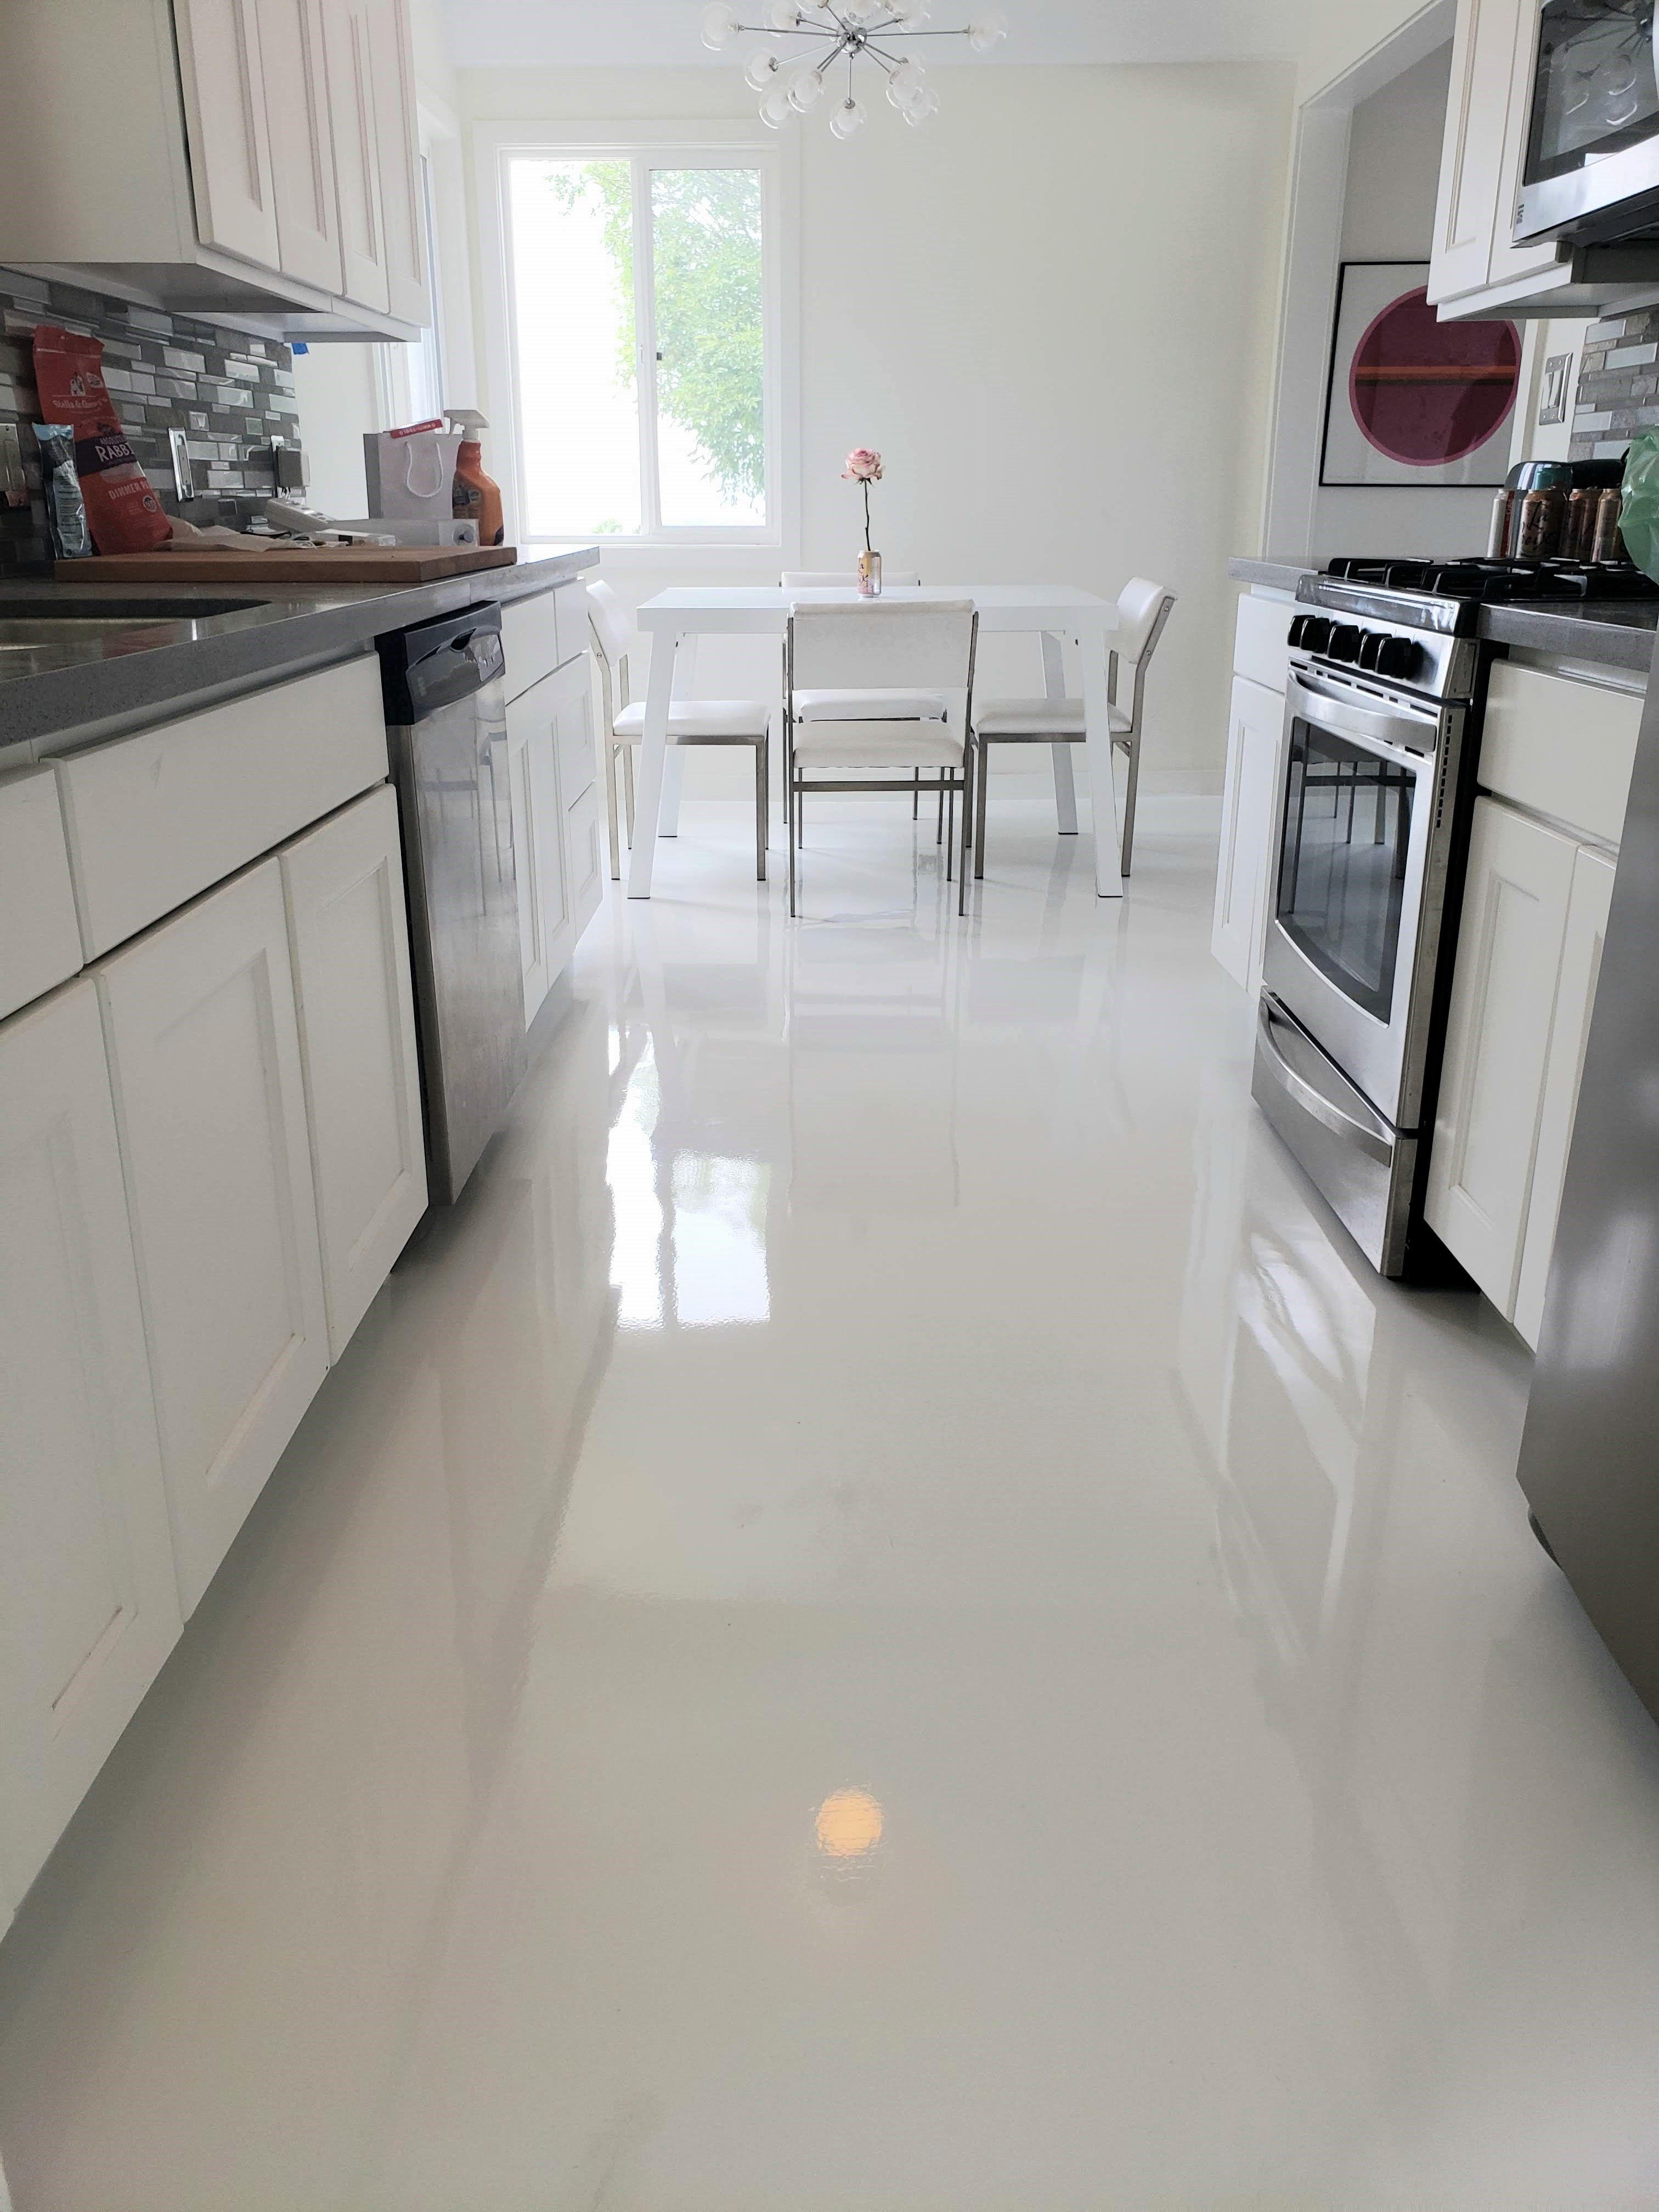 White Epoxy Kitchen Epoxy Floor Flooring Kitchen Flooring